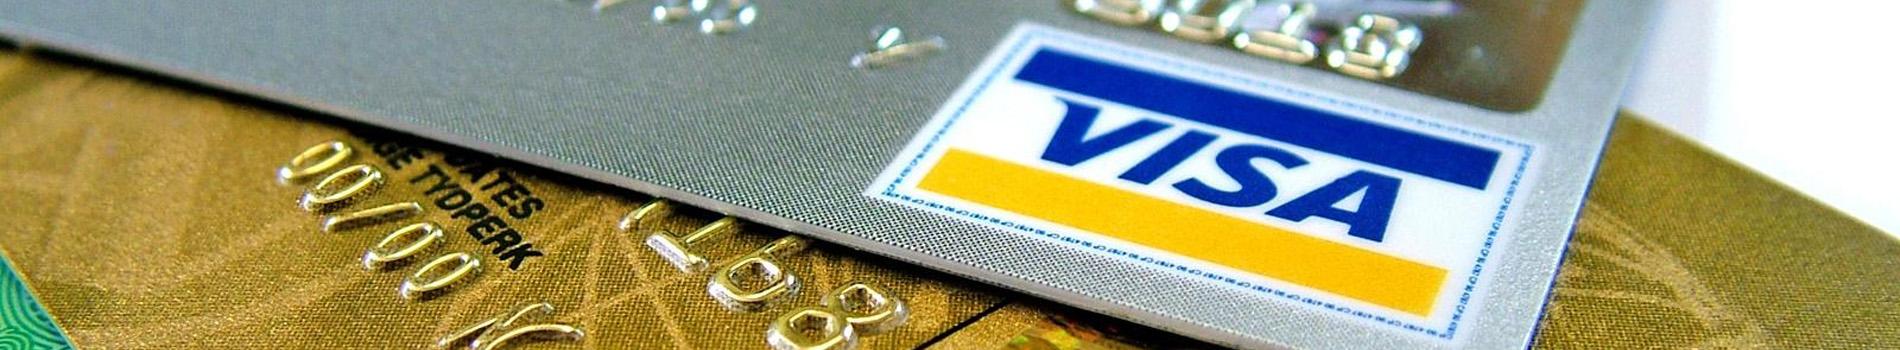 visa-card-img